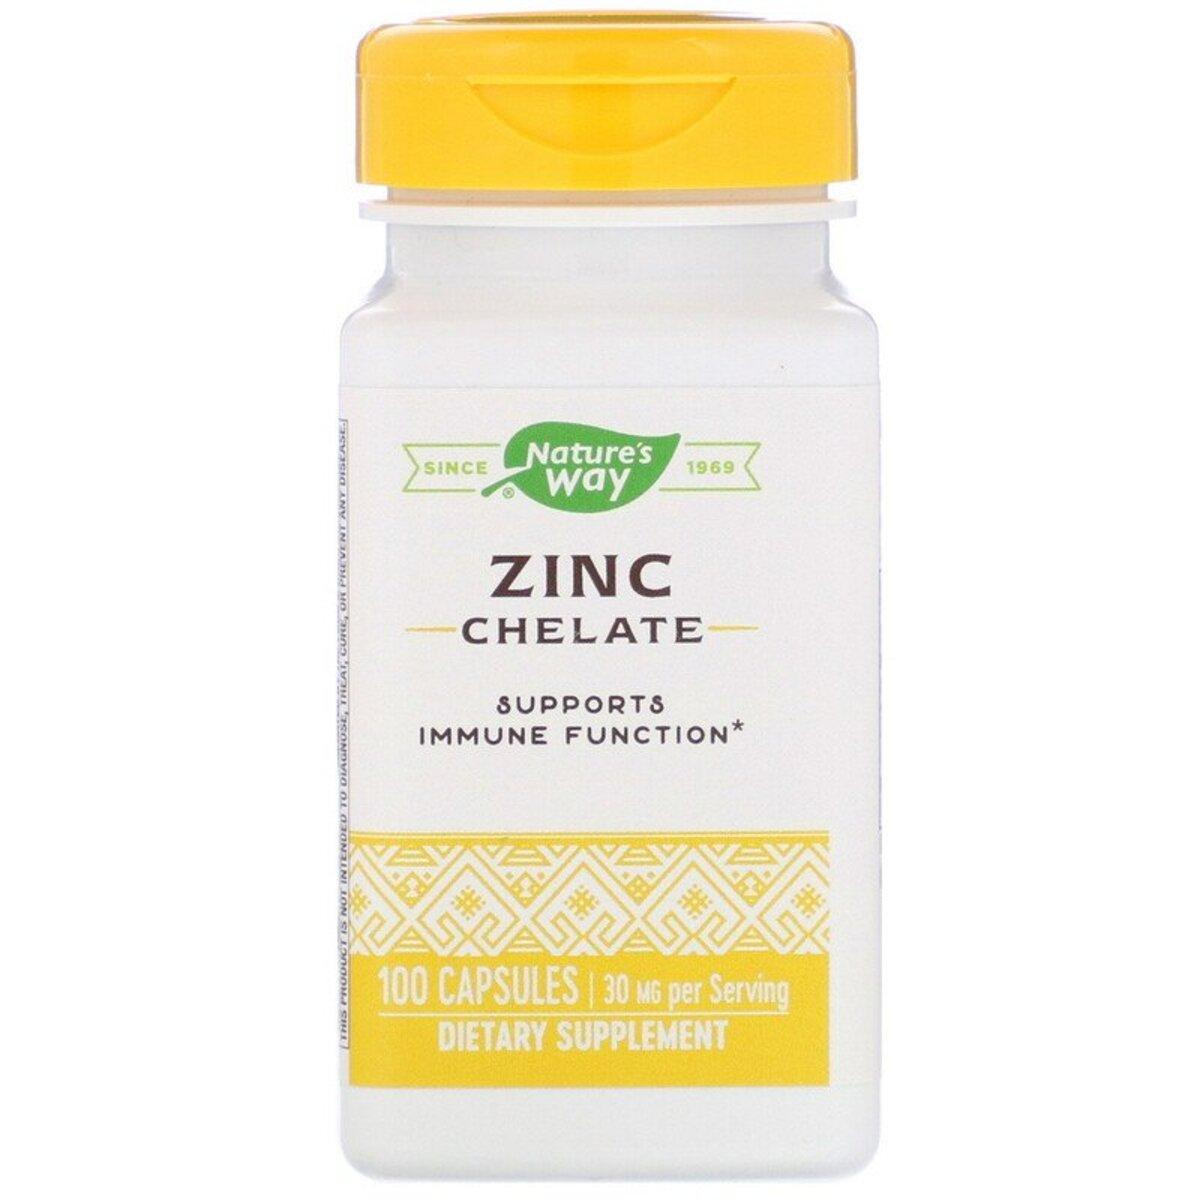 Цинк Хелат, Zinc Chelate, Nature's Way, 30 мг, 100 капсул